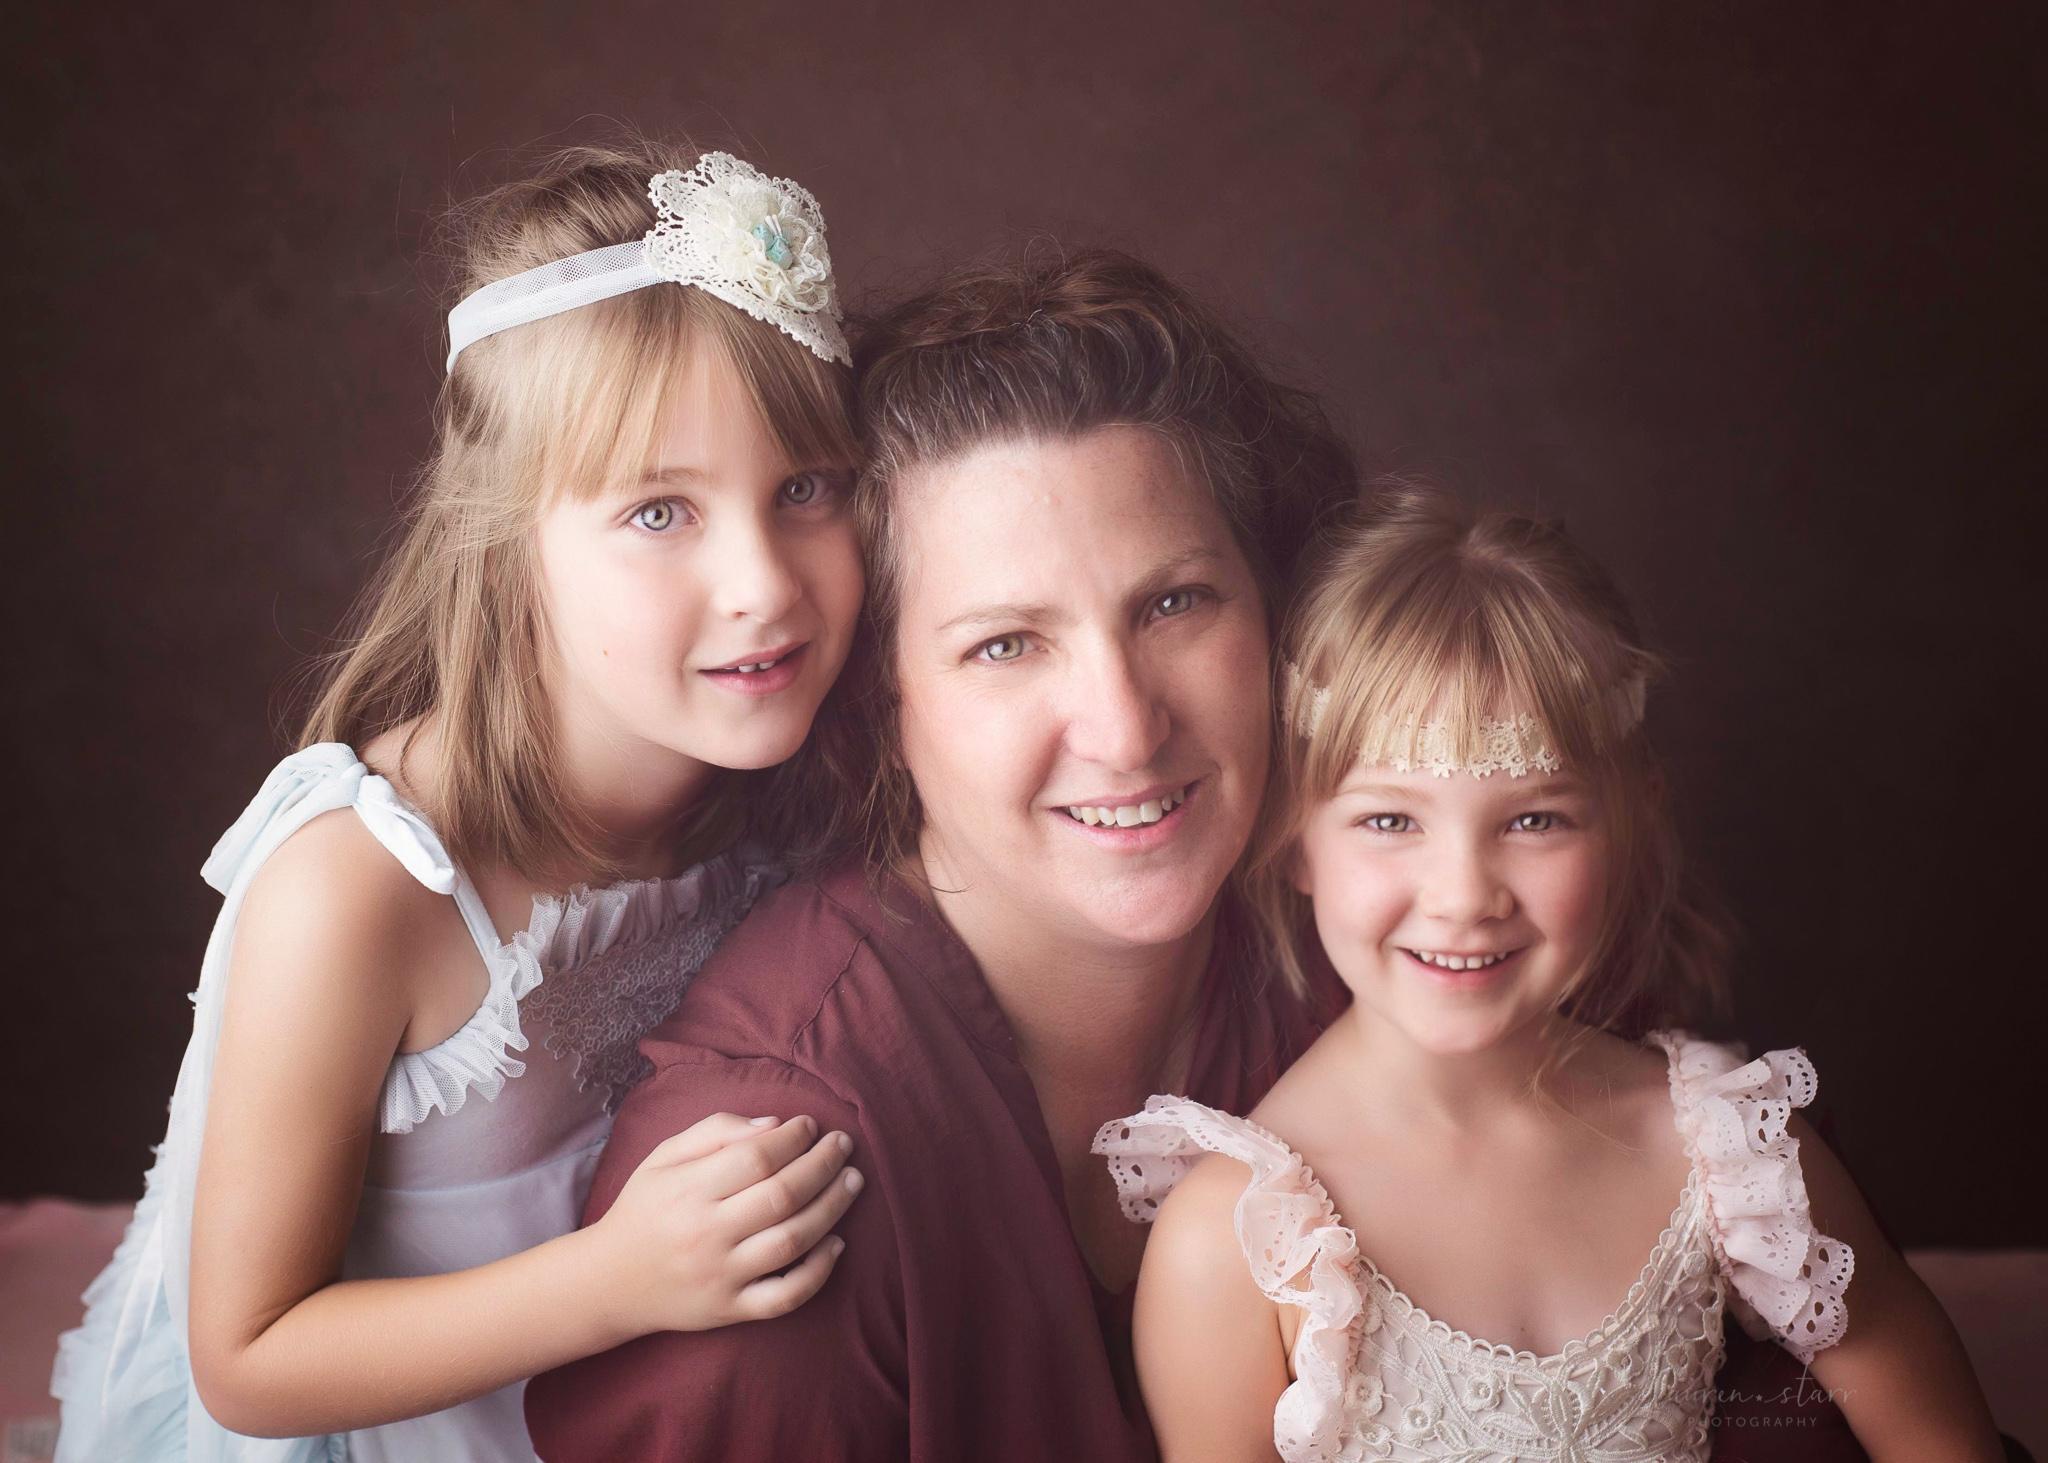 laurenstarr-fineartphotography-awardwinningphotographer-bendigophotographer-bendigofamilyportraits-familyphotographerbendigo-1-2.jpg